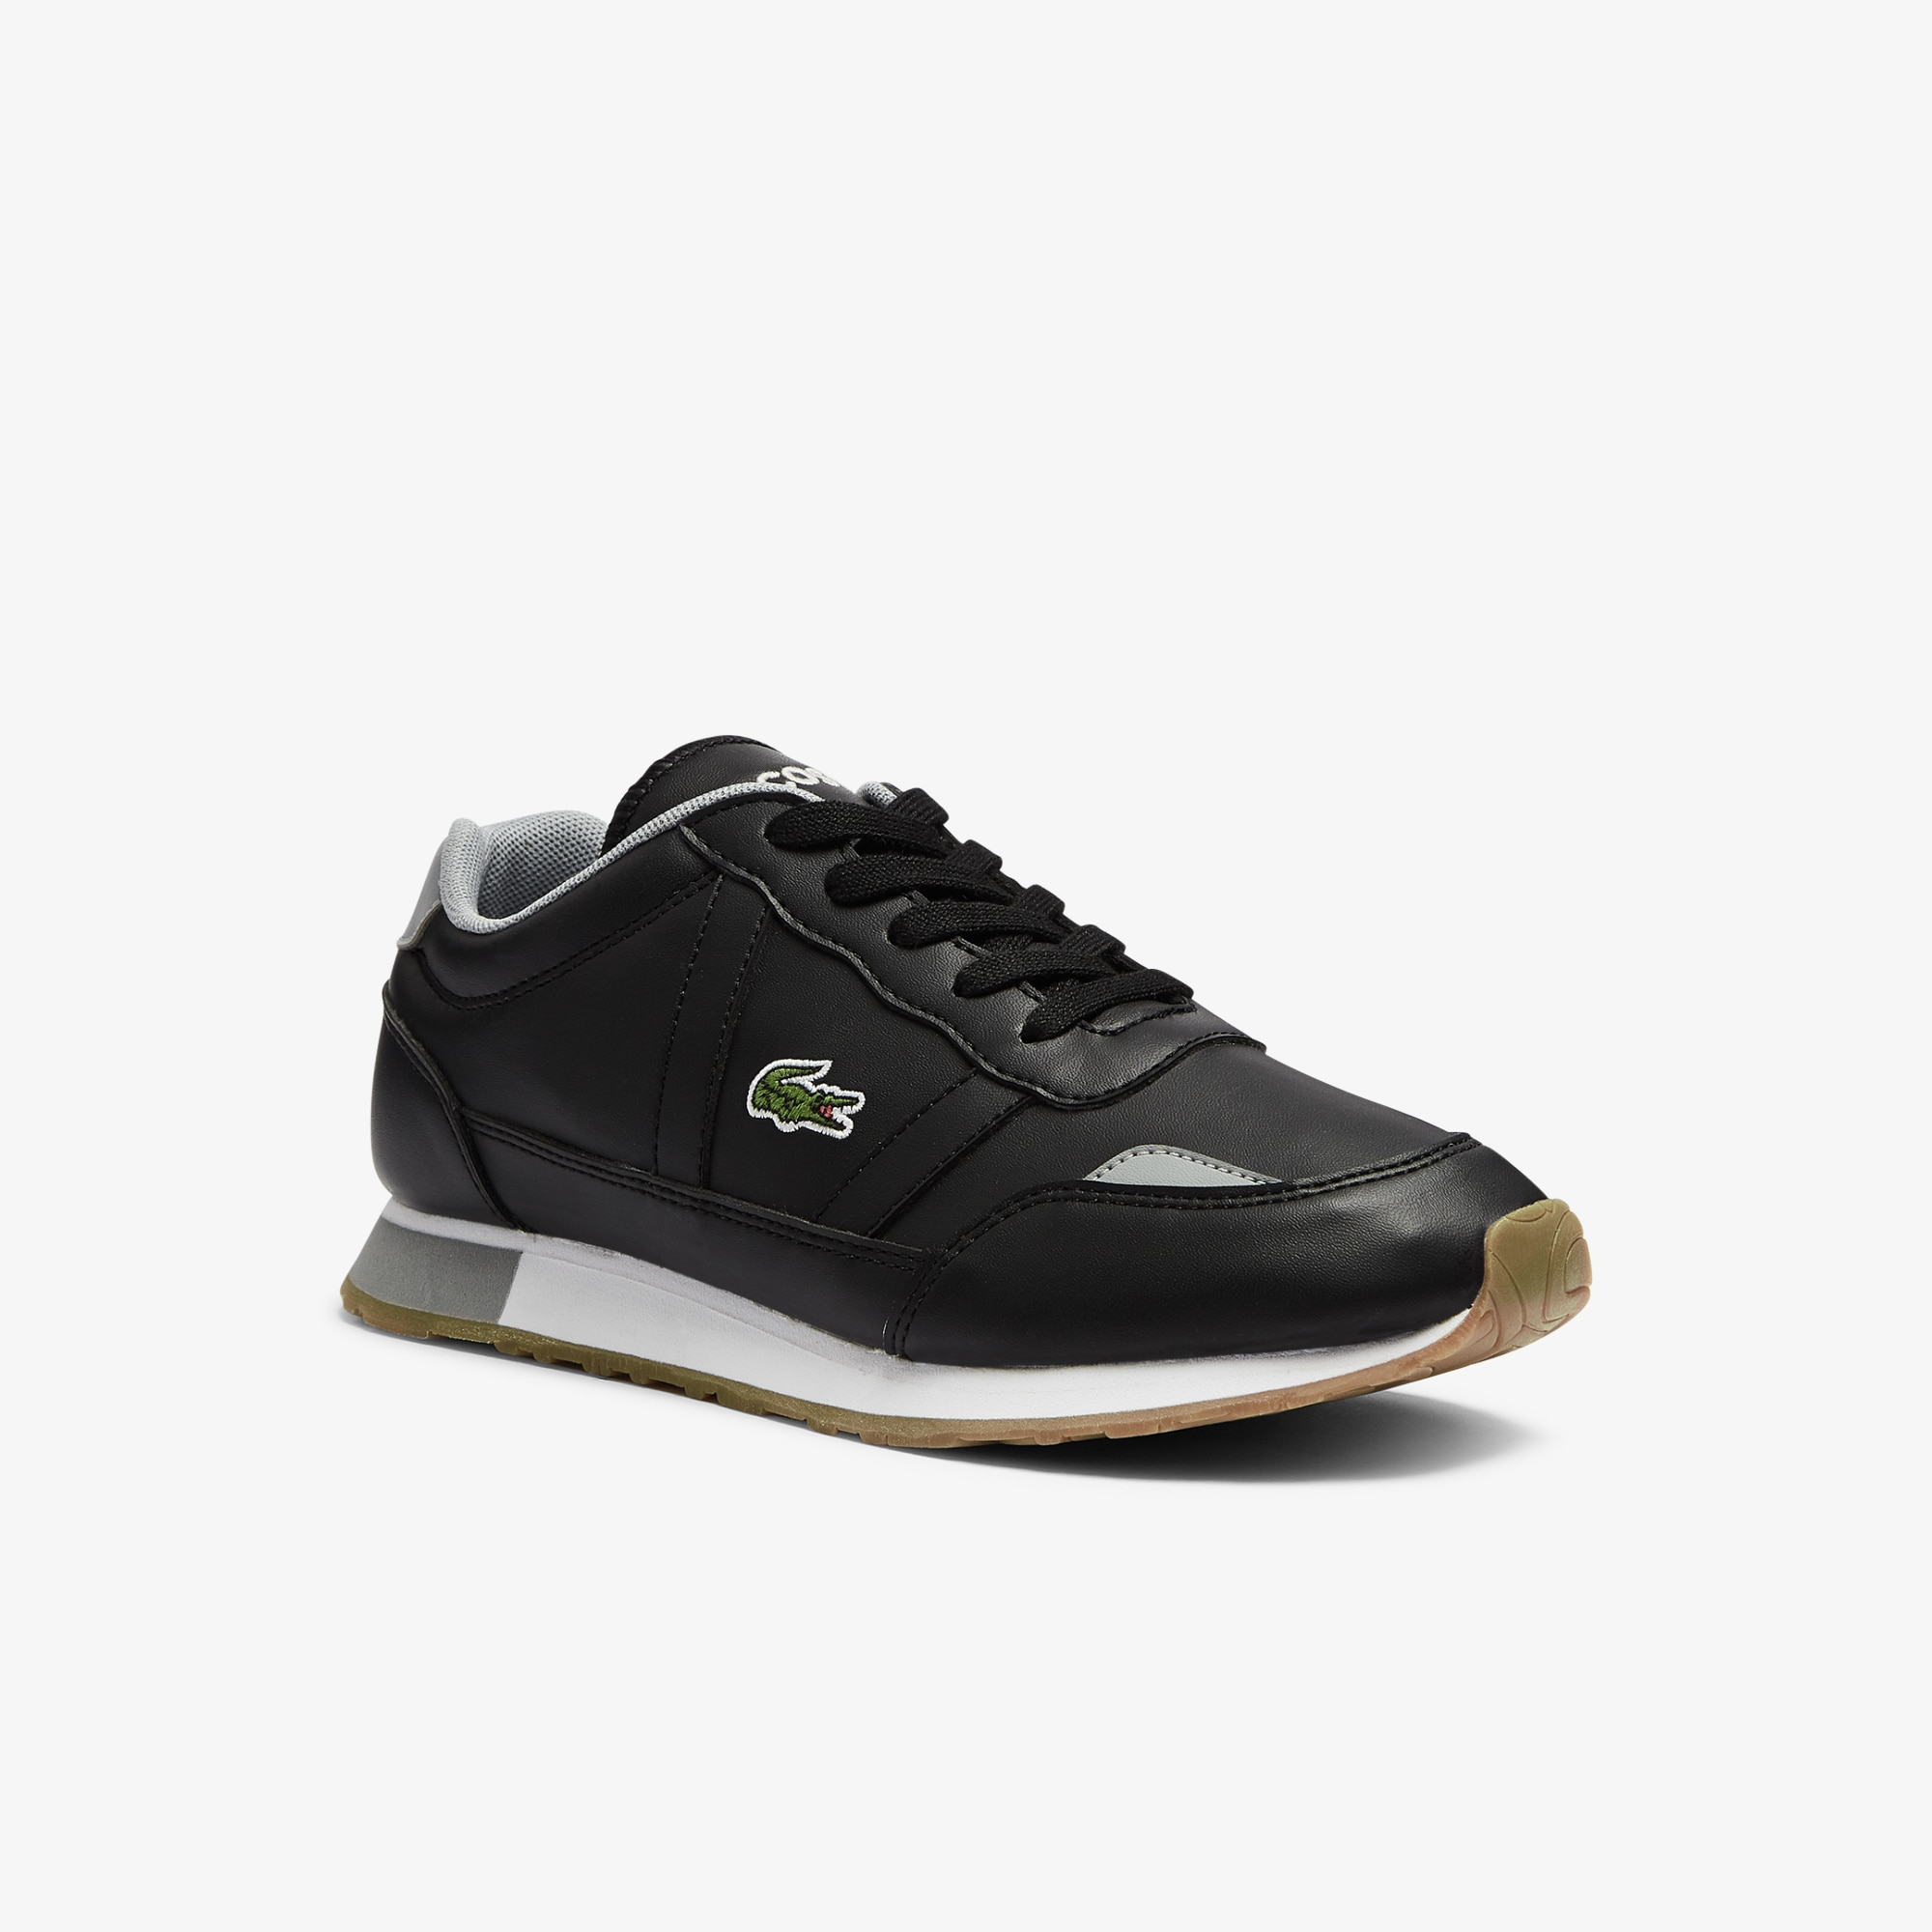 Lacoste Sneakers Partner ado en tissu Taille 39 Noir/gris